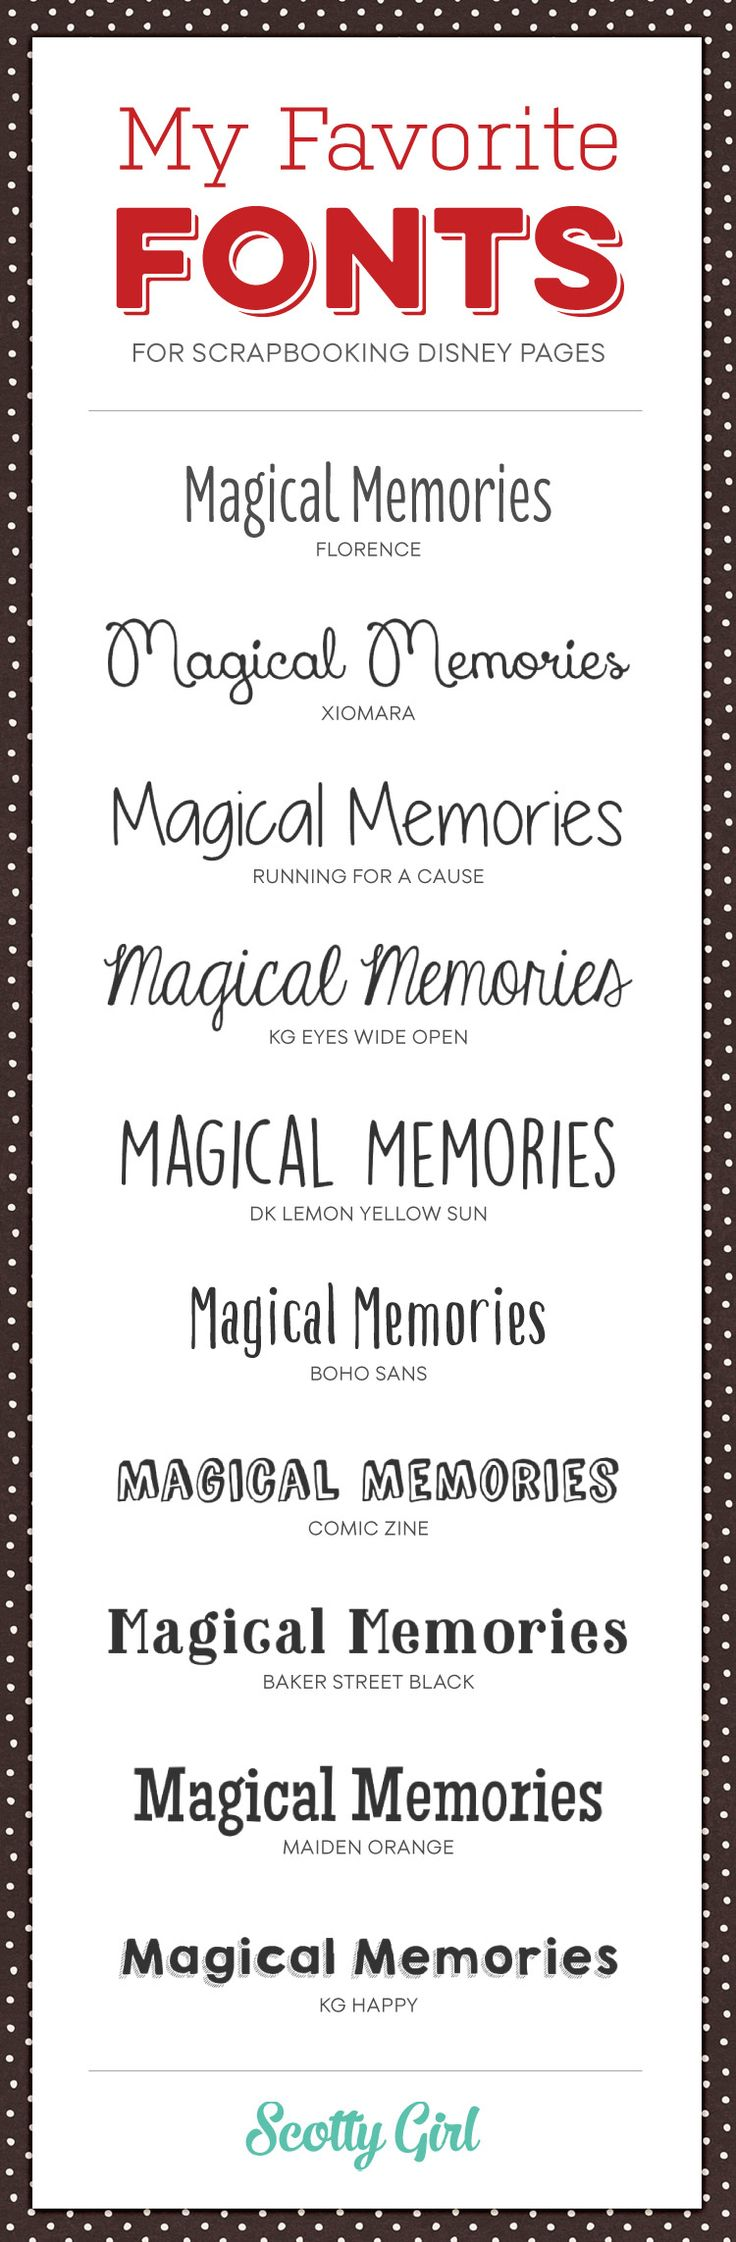 10 Favorite Fonts for Scrapbooking Your Disney Pages | scottygirldesign.com #typography #disneyscrapbooking